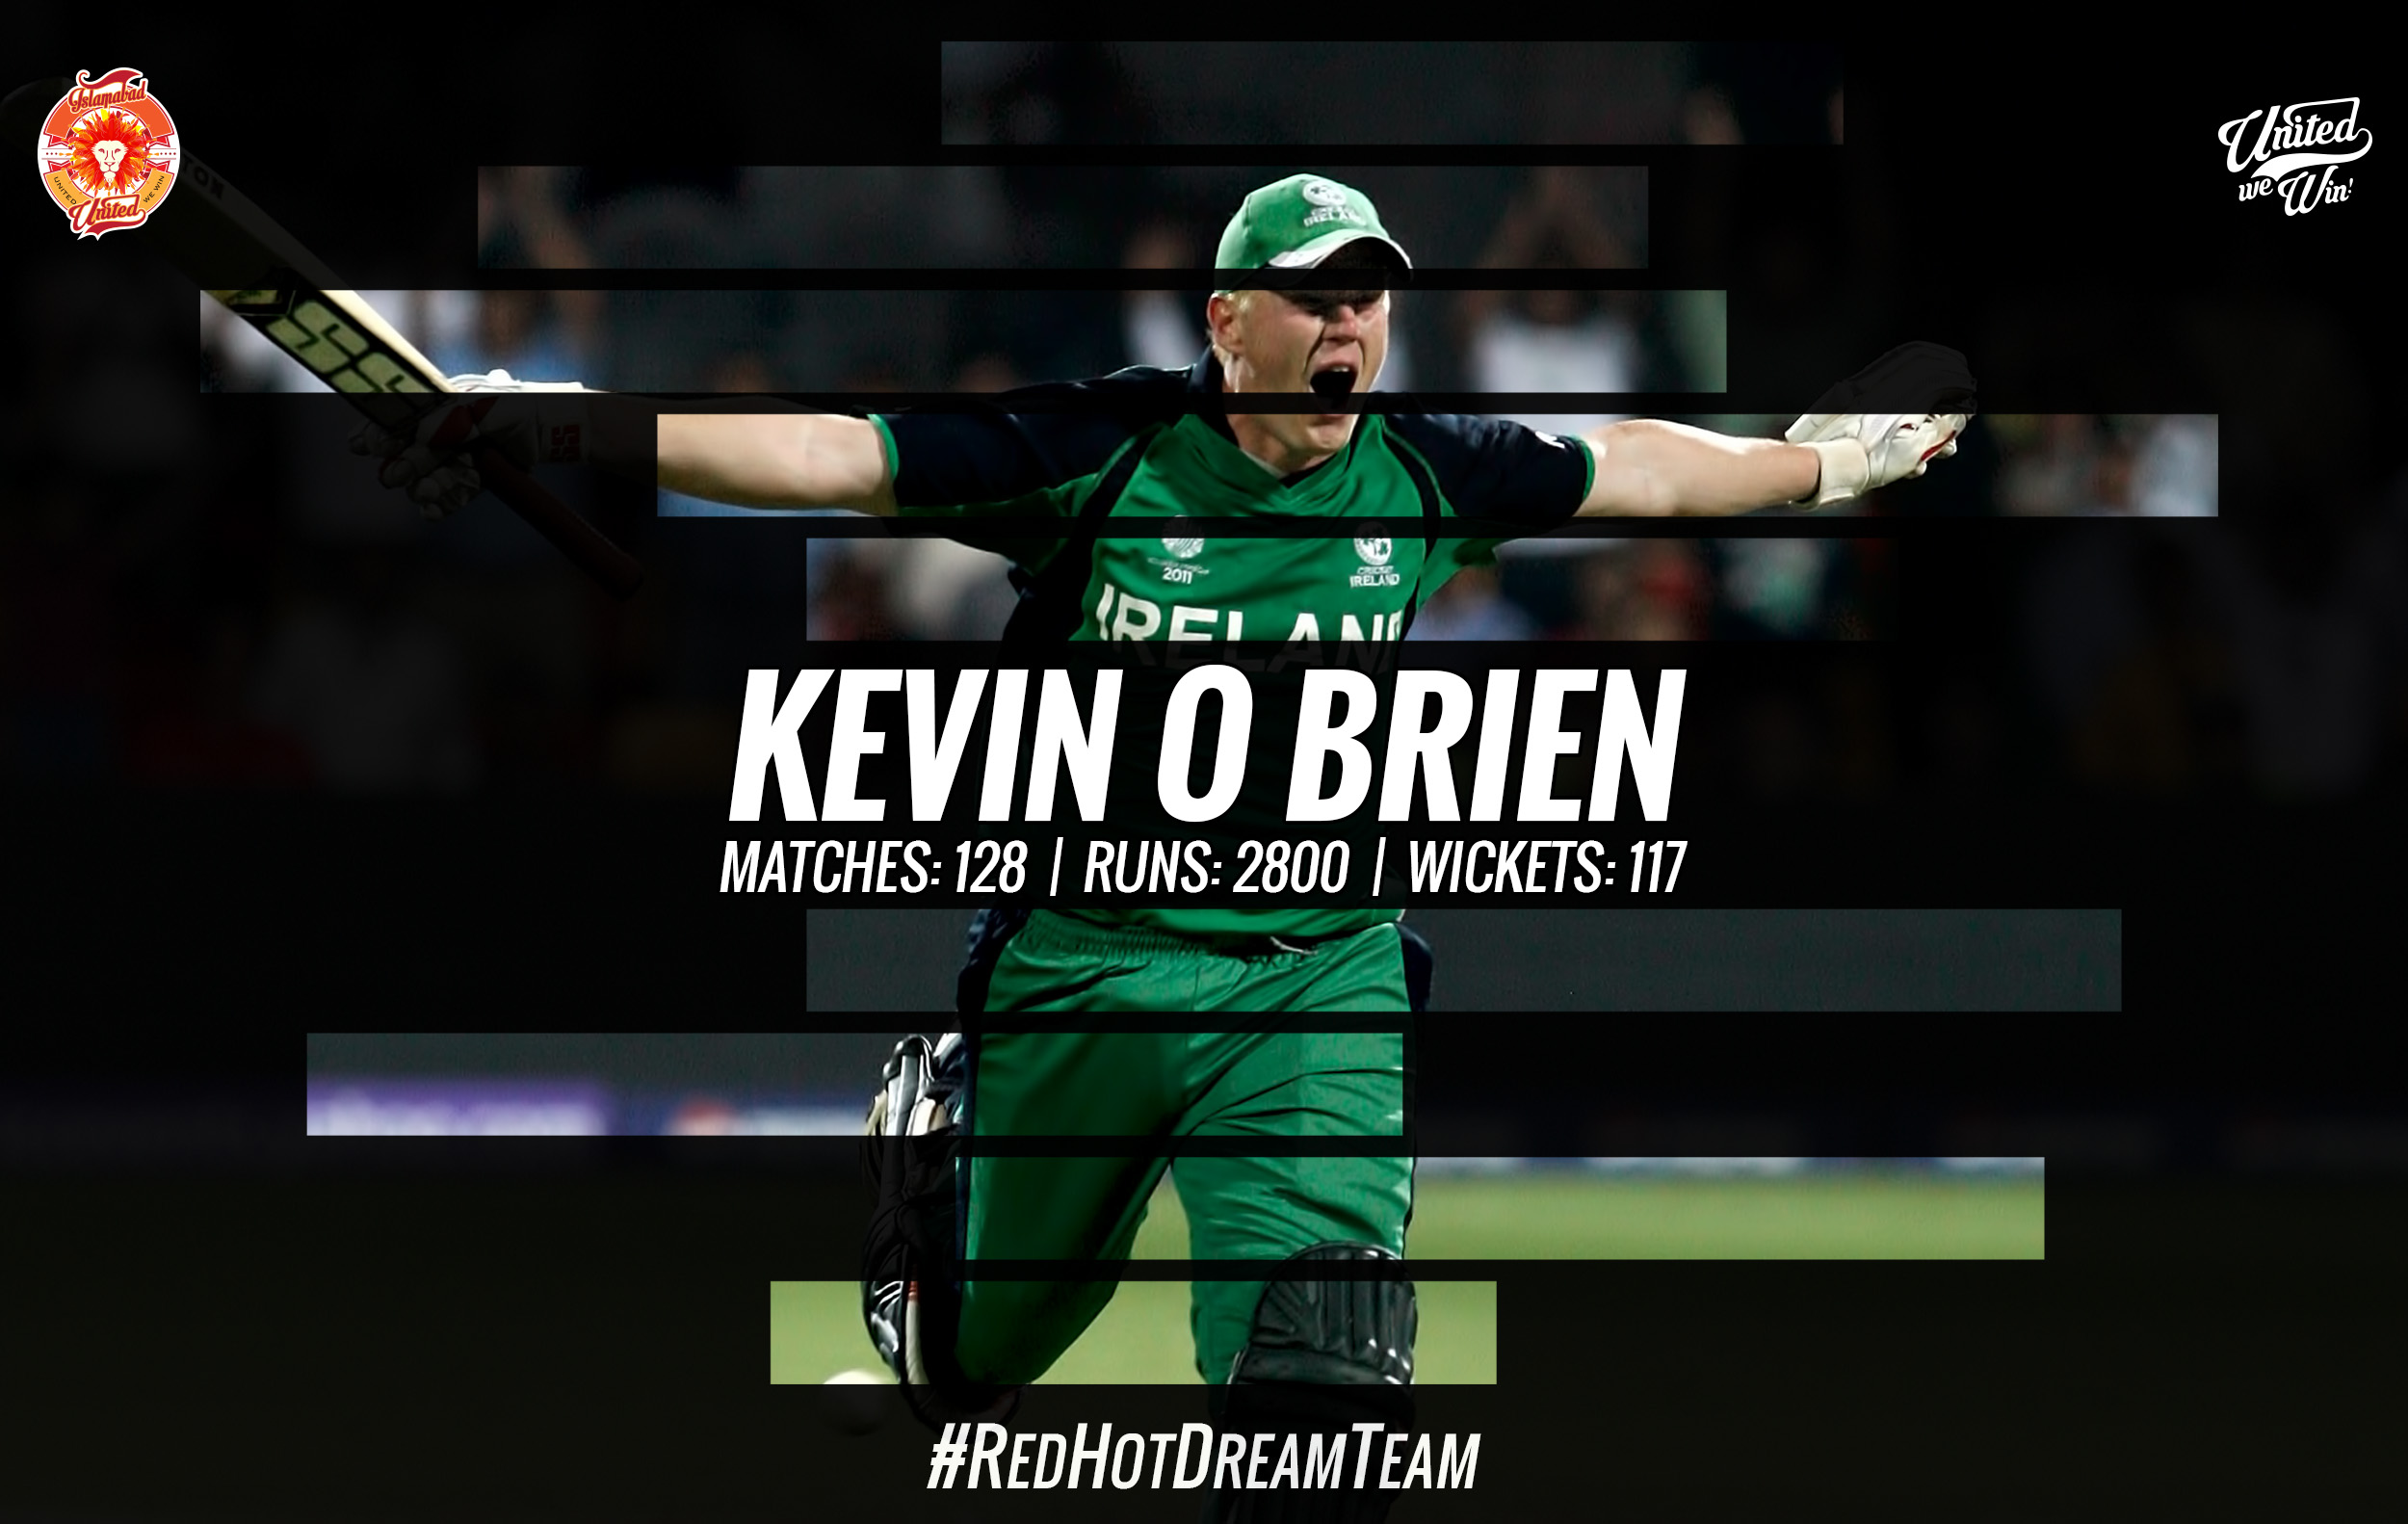 kevin O Brien